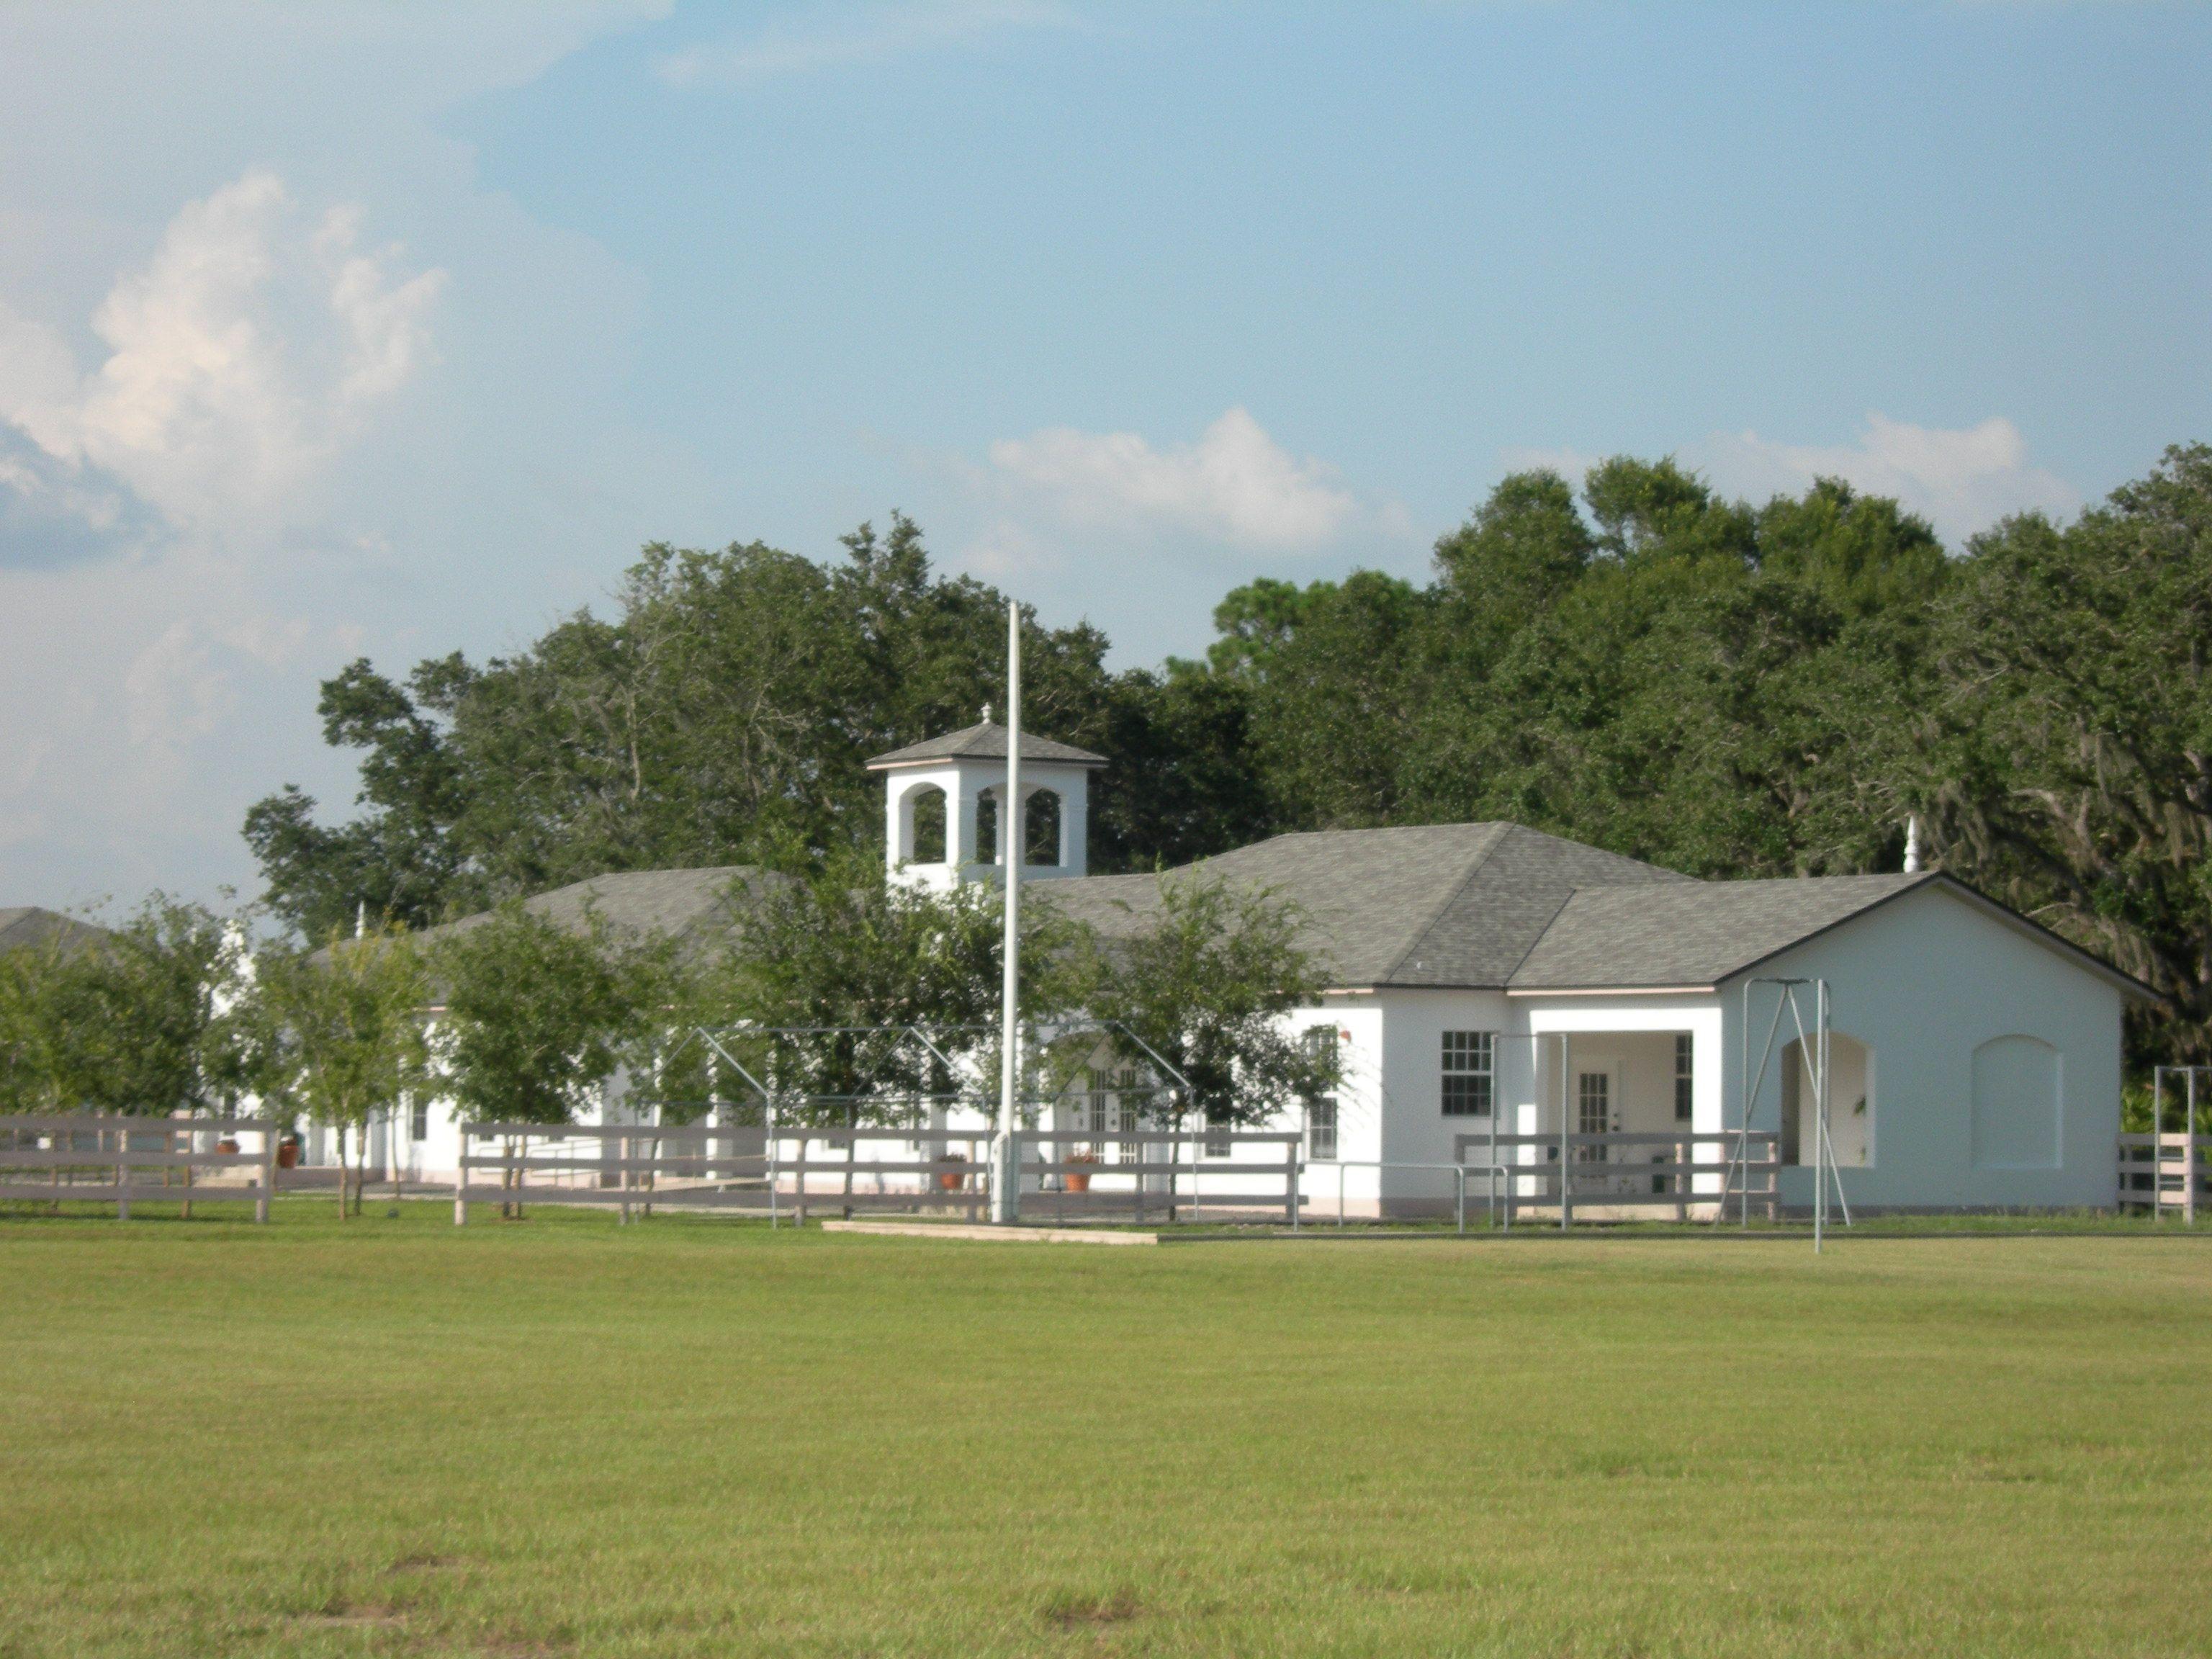 New Gate School, Clark Road campus, Sarasota, Florida - now Island Village Montessori School